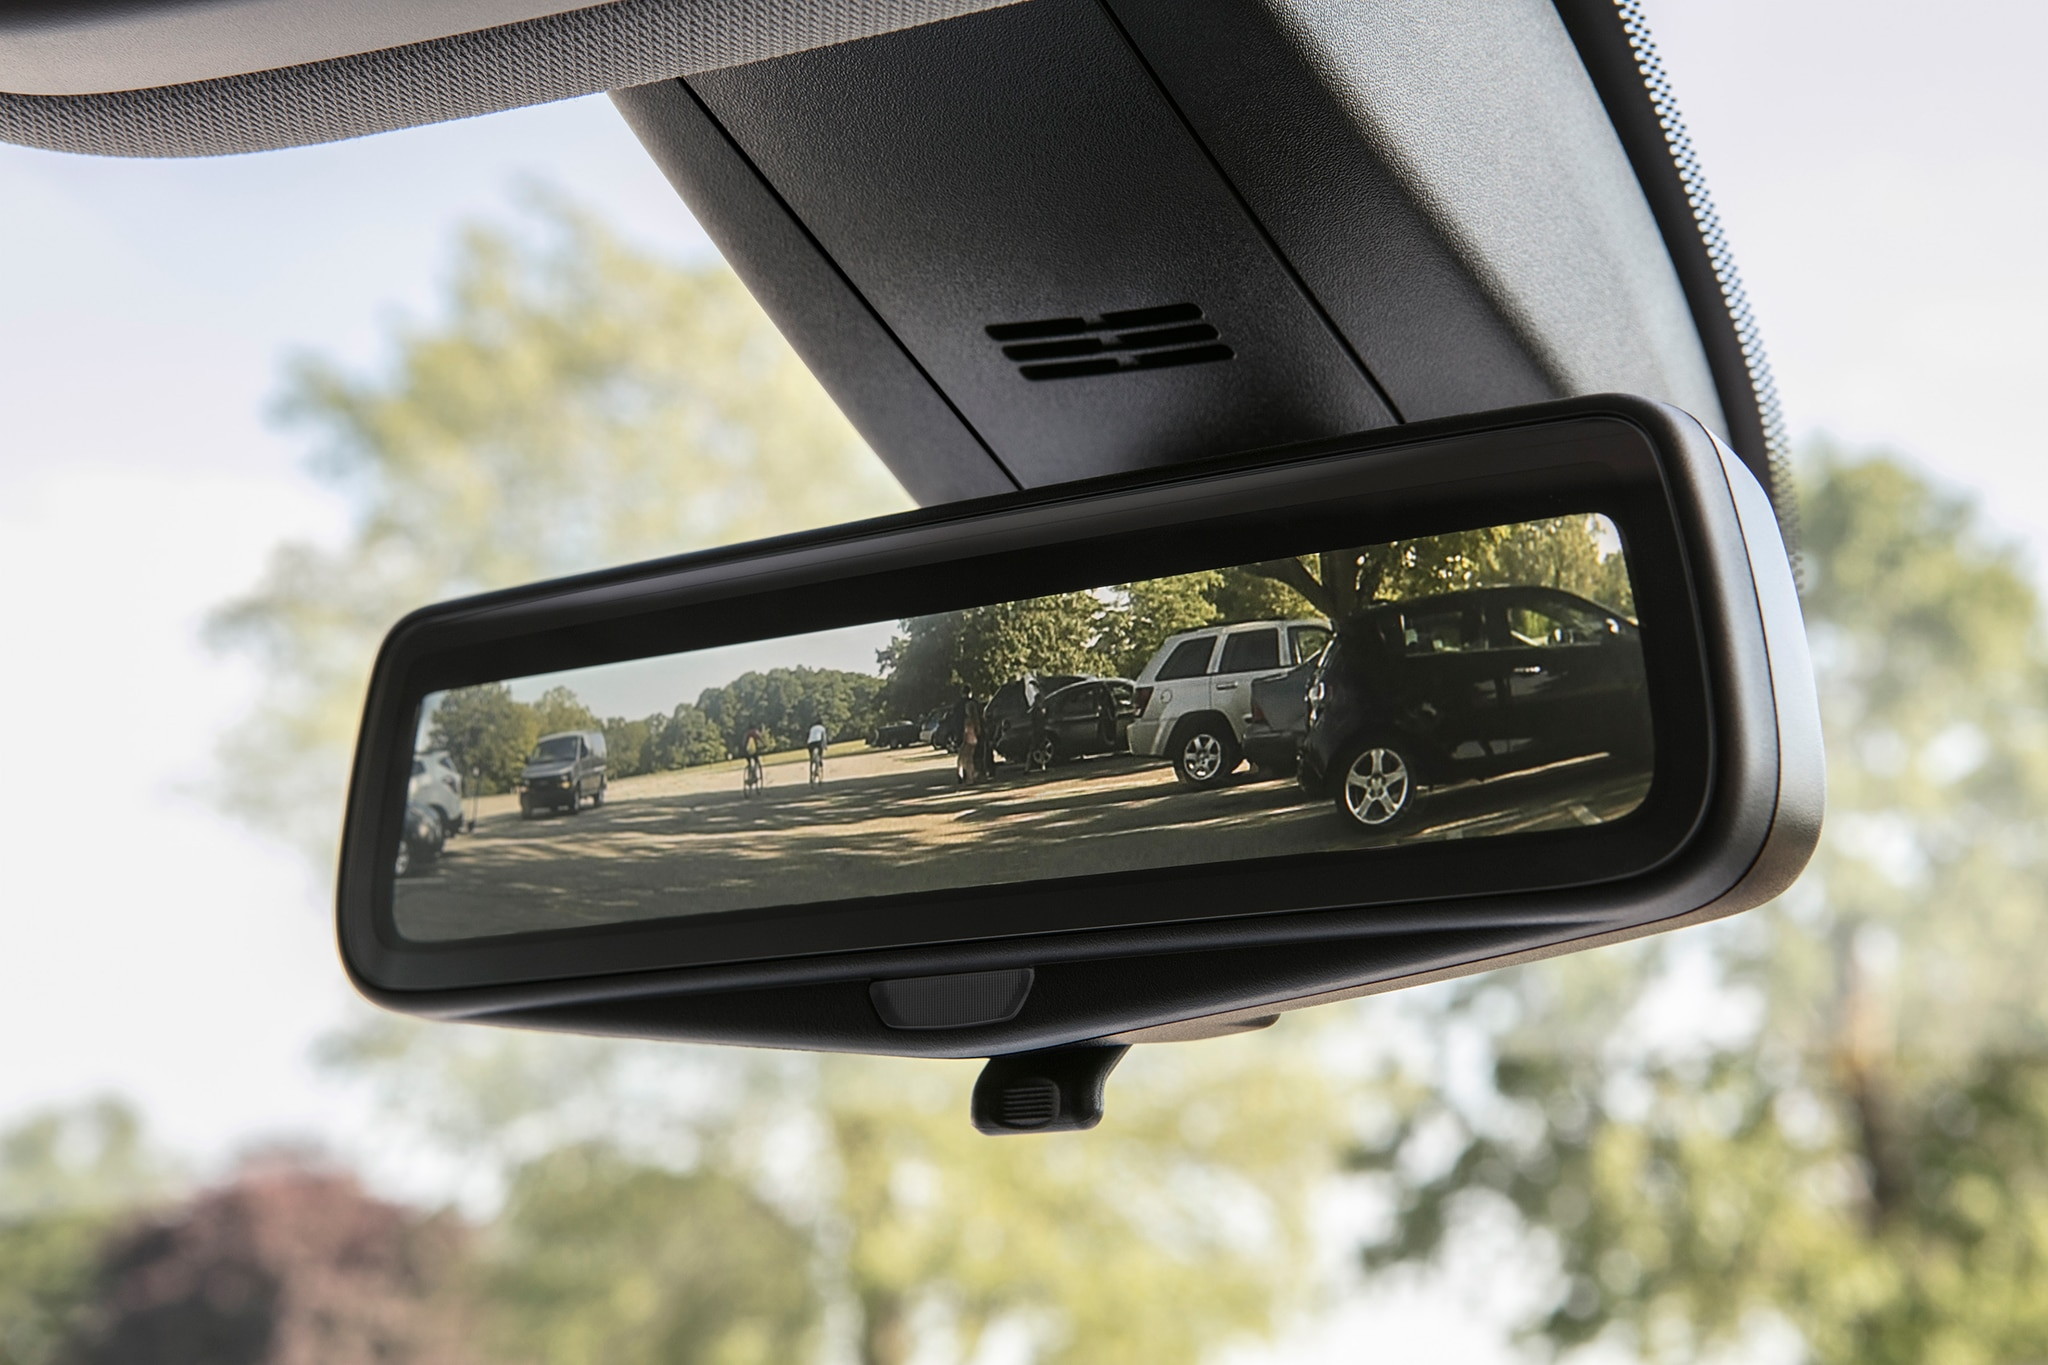 2018 Chevrolet Traverse Premier First Drive Review ...